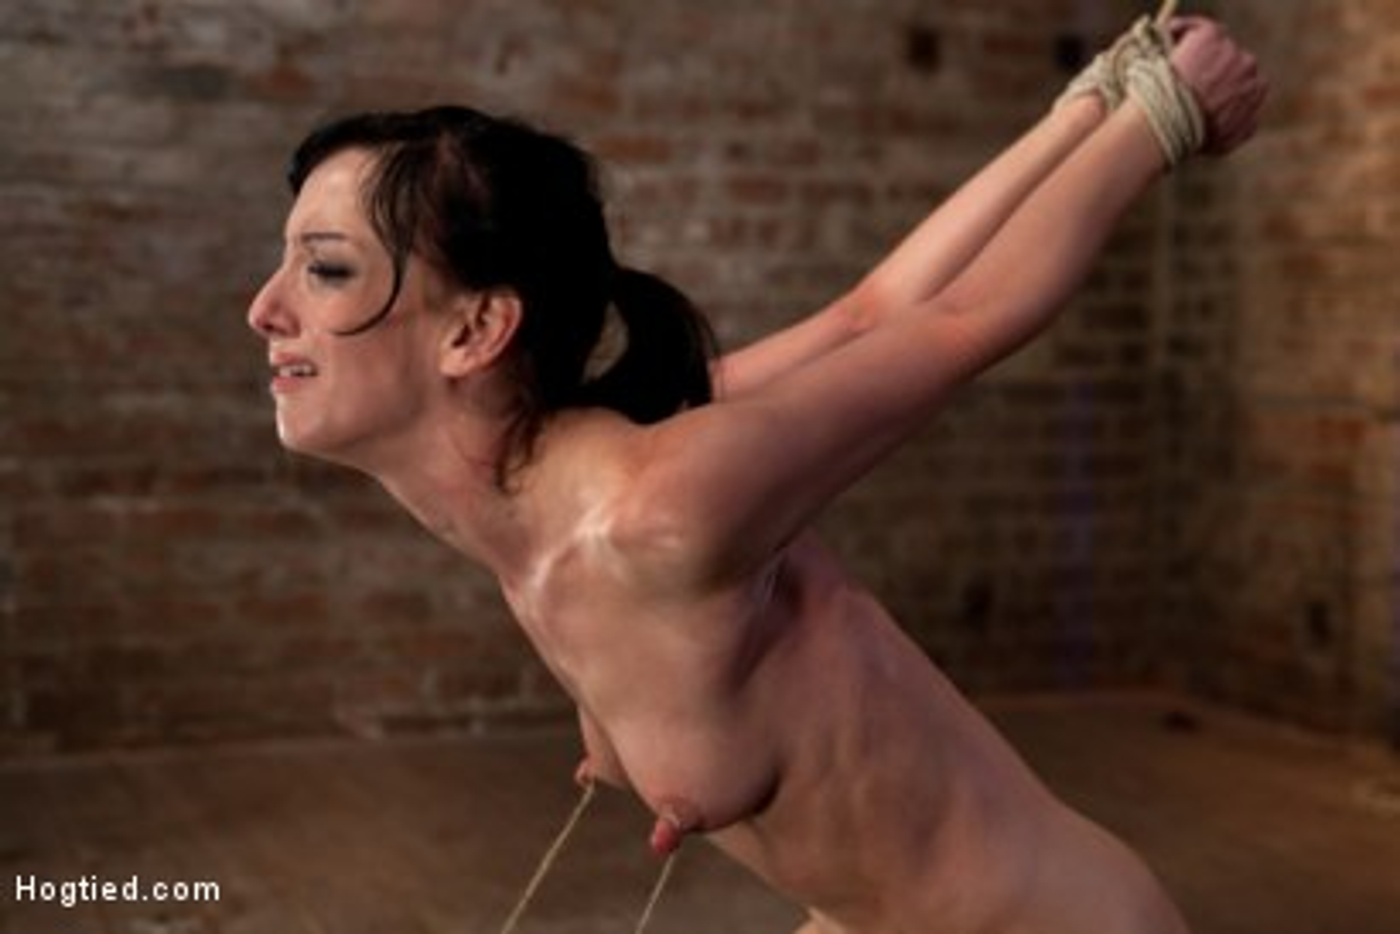 Sexy village girl naked photo